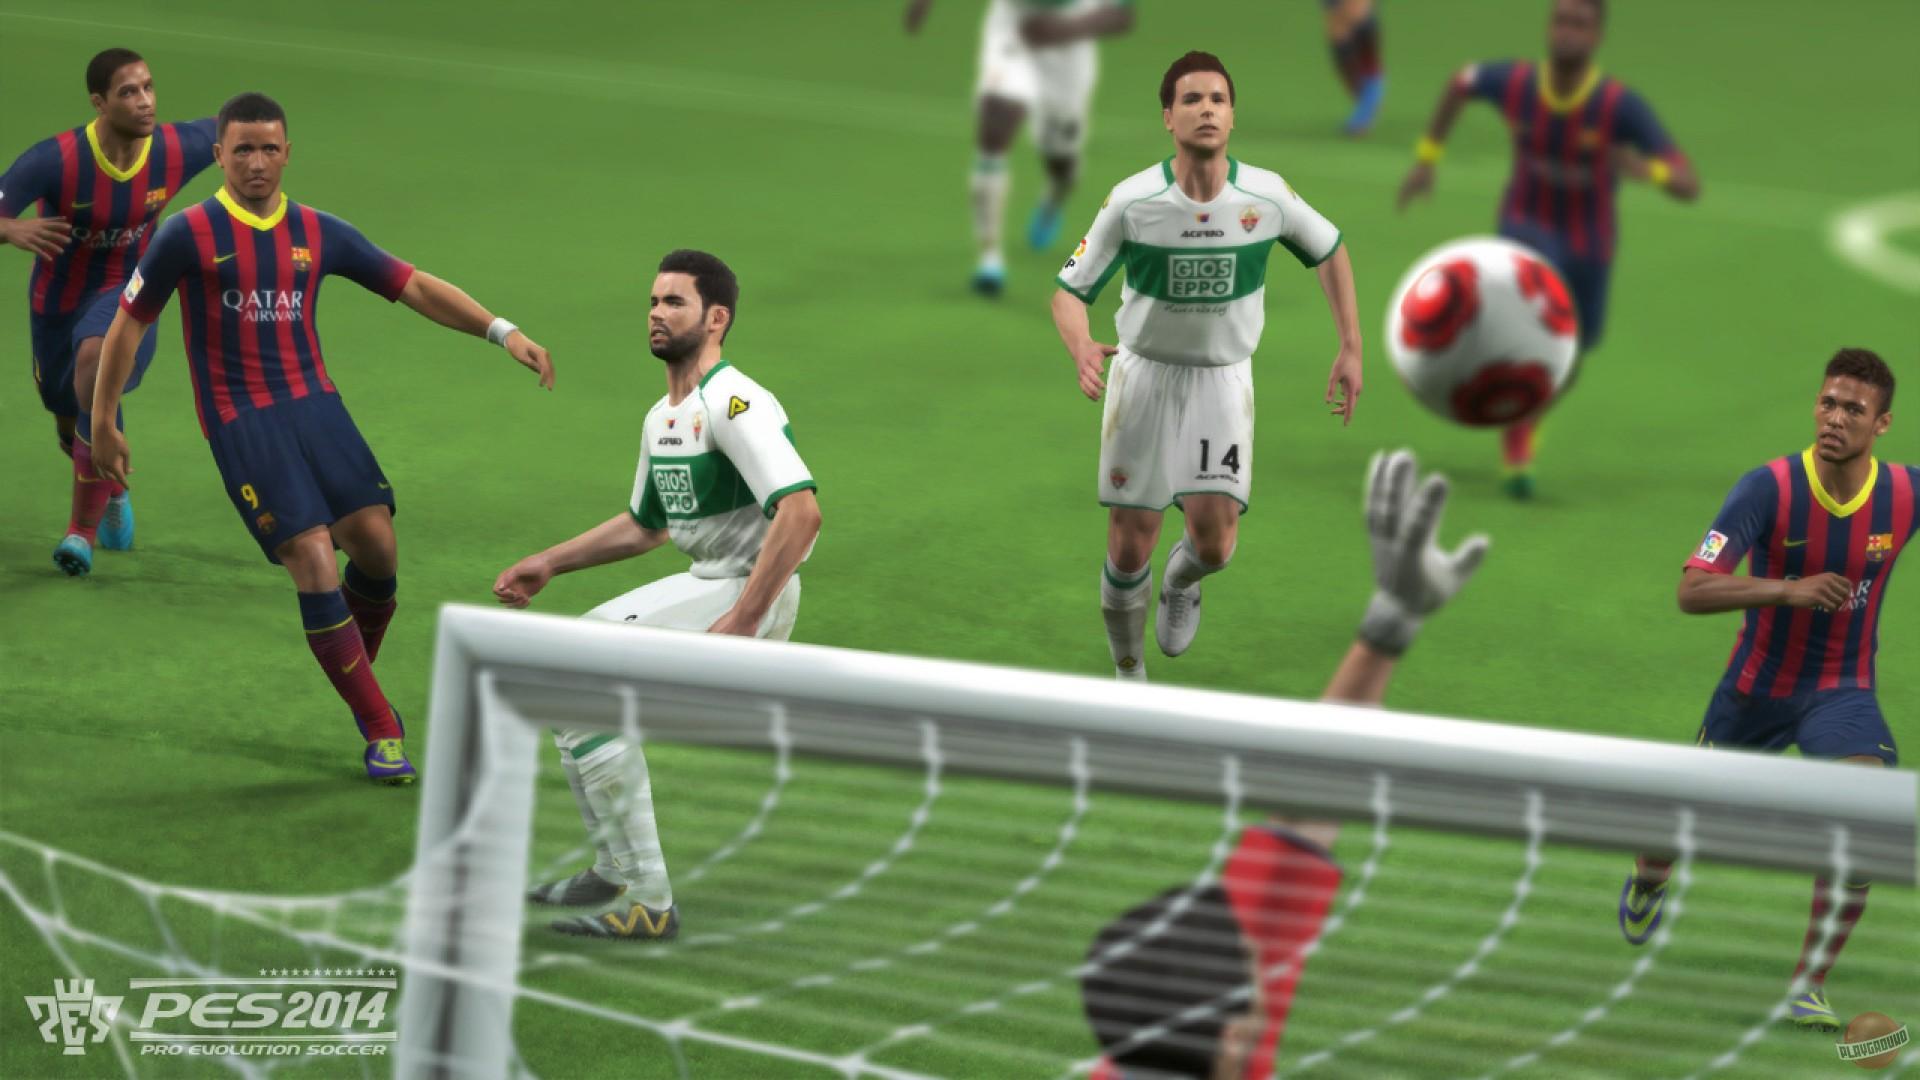 Скриншоты Pro Evolution Soccer 2014 - галерея, снимки экрана, скриншоты